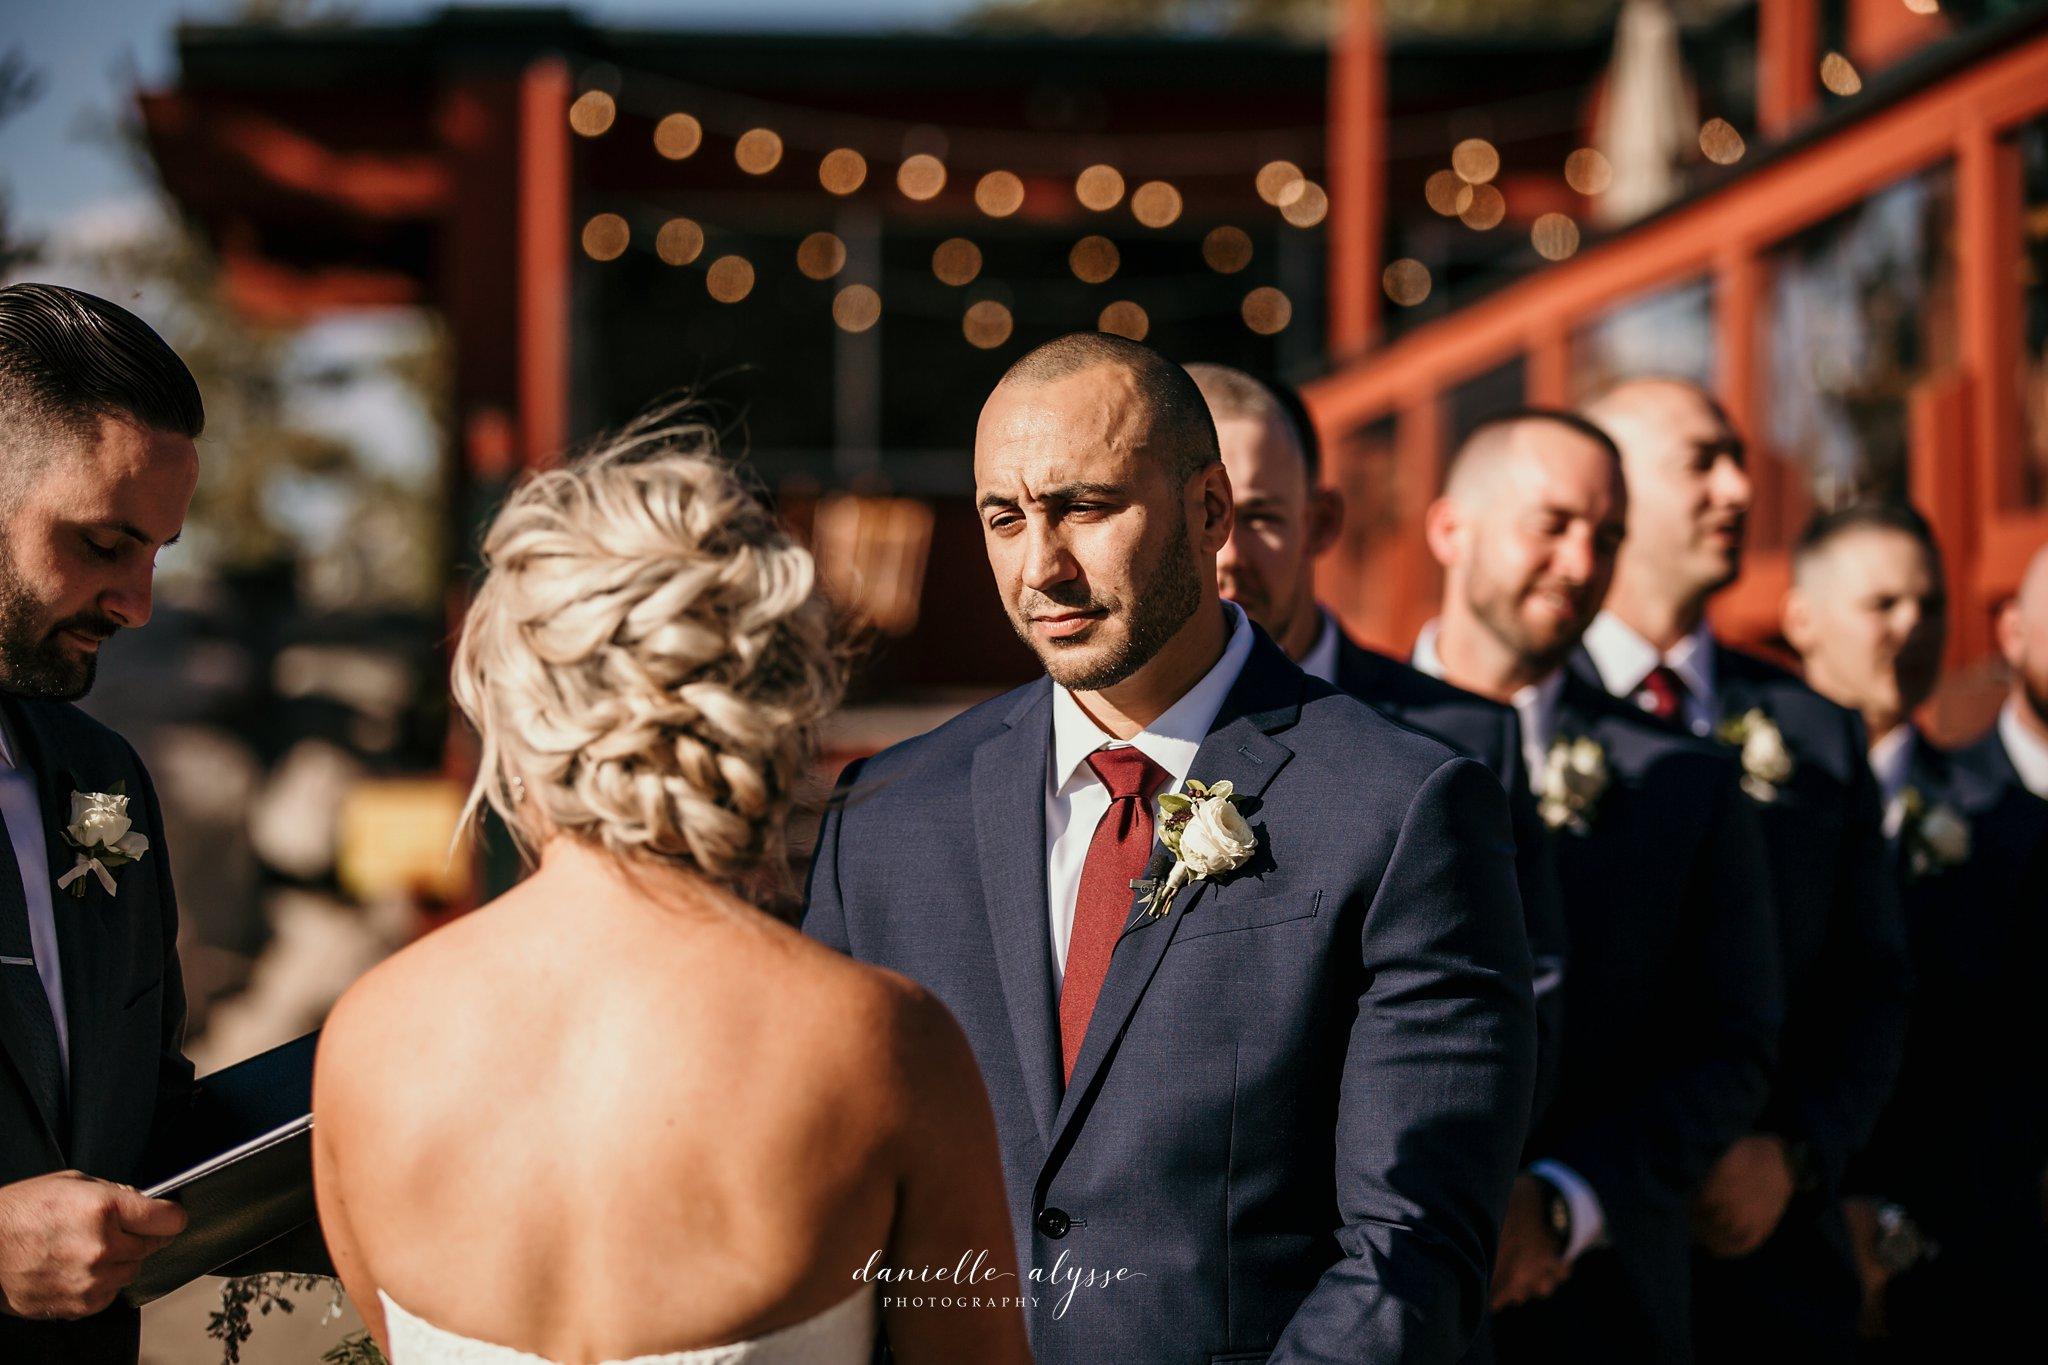 180831_wedding_stephanie_heavenly_south_lake_tahoe_danielle_alysse_photography_destination_blog_659_WEB.jpg